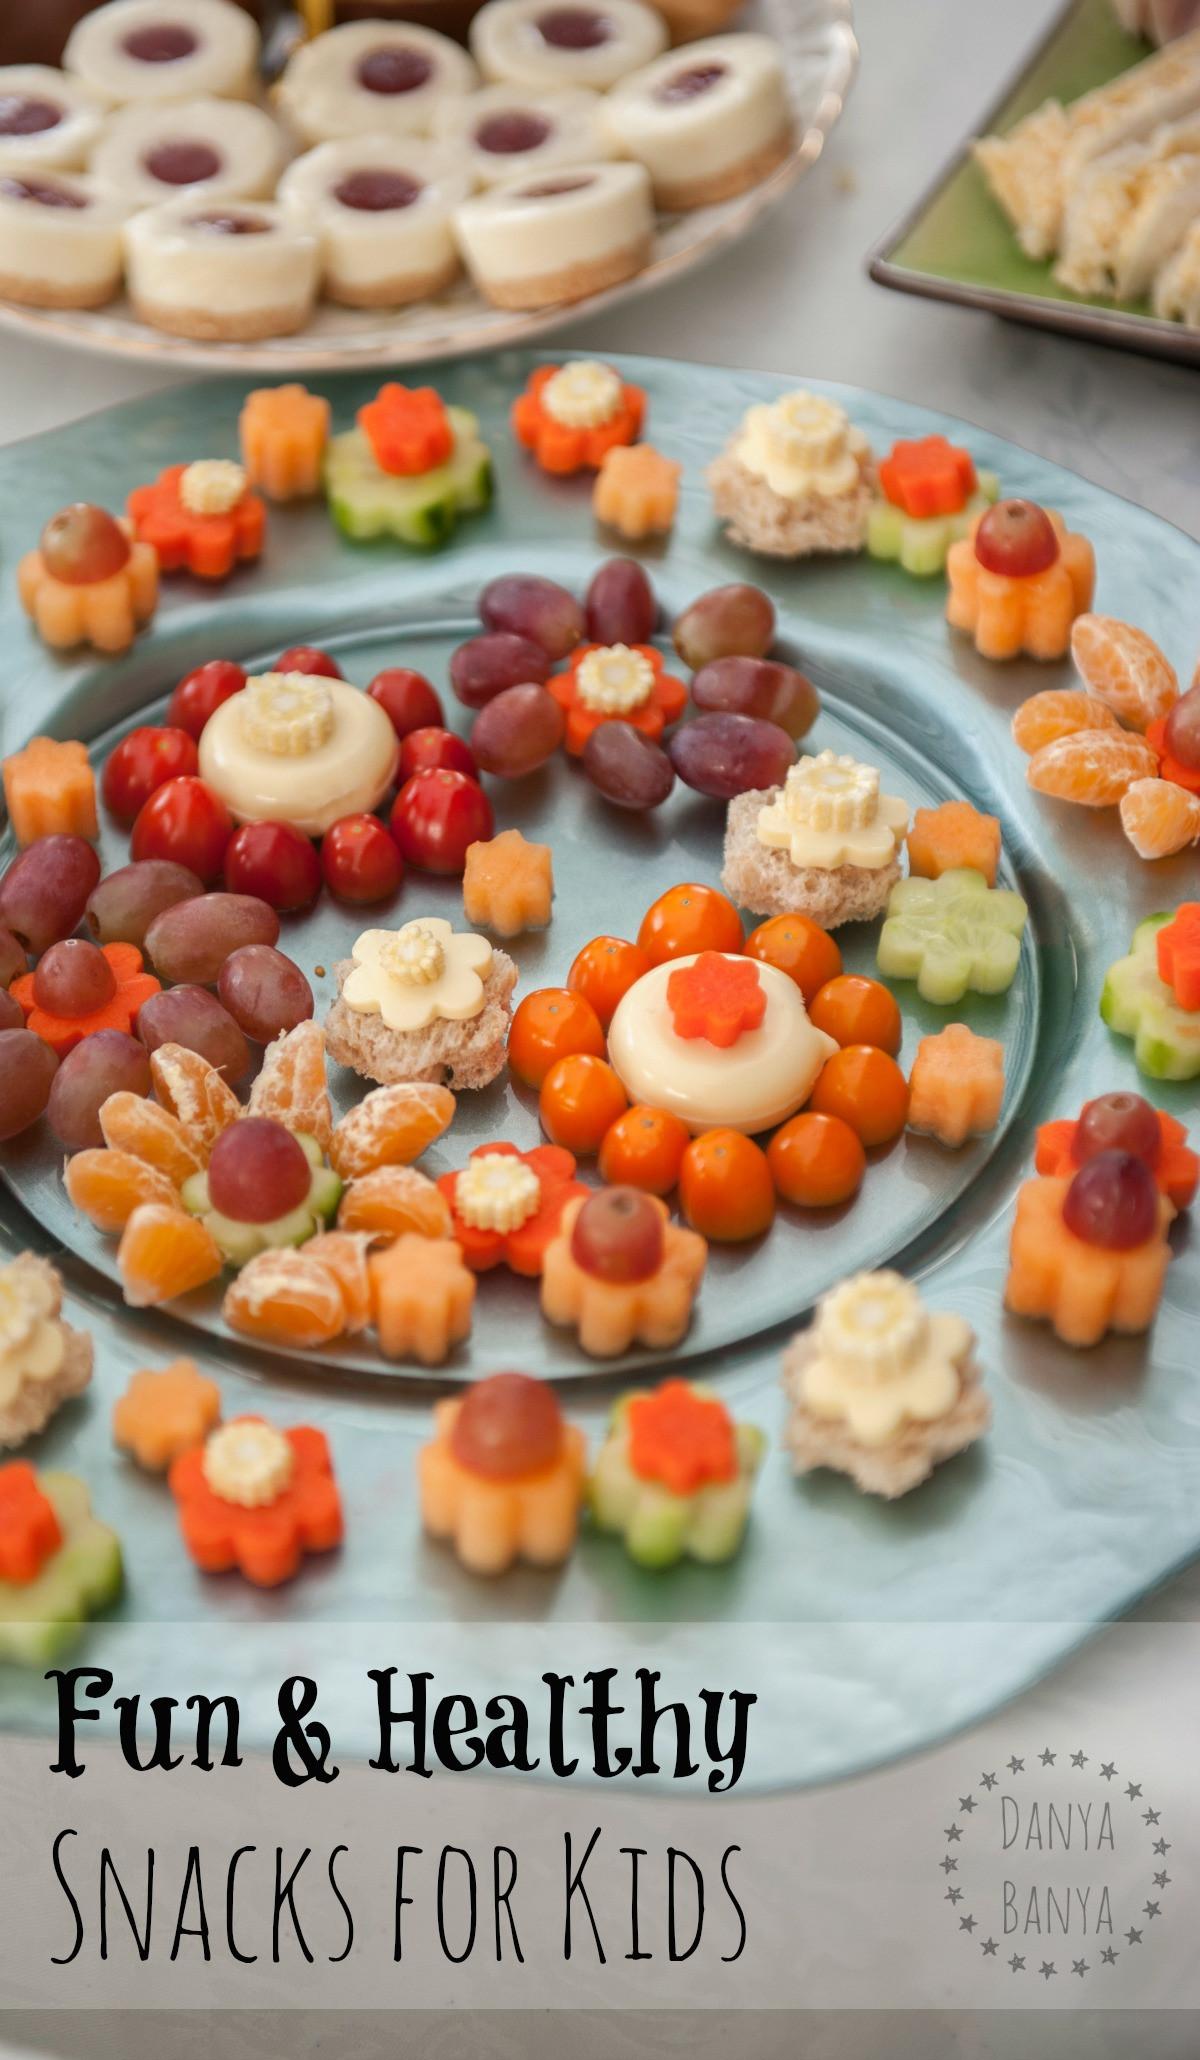 Fun Healthy Snacks For Kids  Fun & Healthy Snacks for Kids – Danya Banya